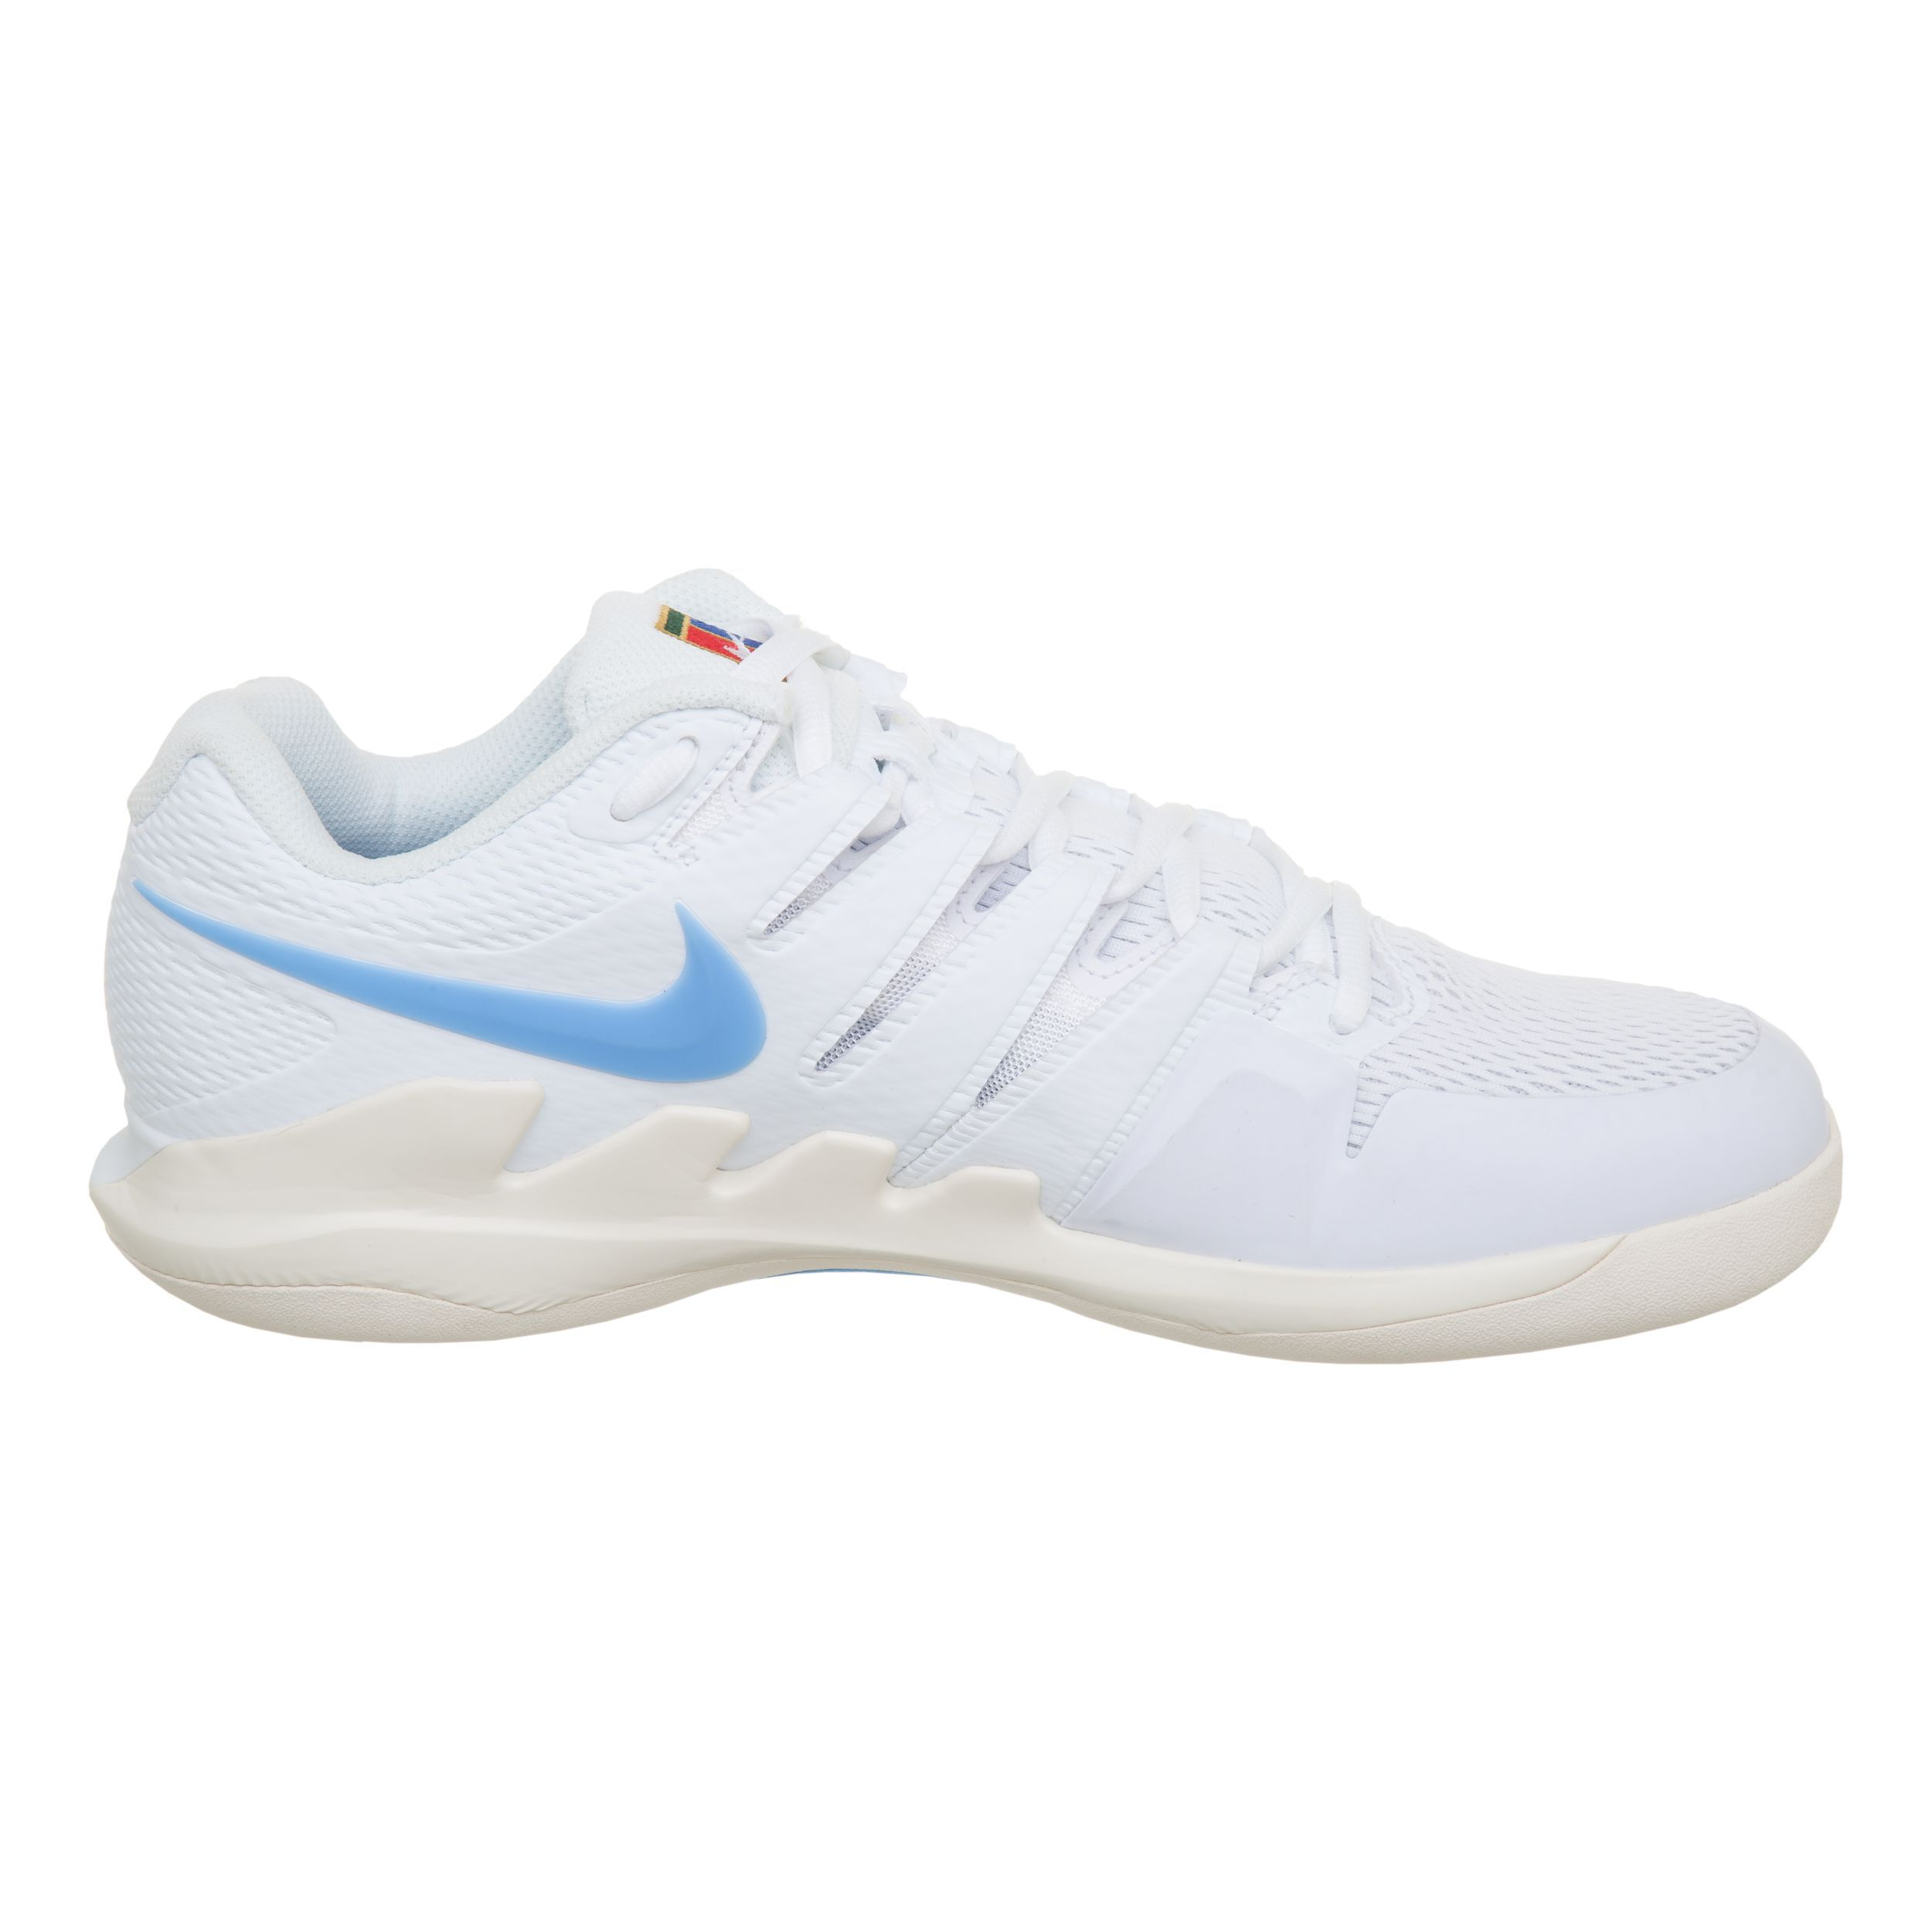 Nike Air Zoom Vapor X Carpet Teppichschuh Kinder Weiß